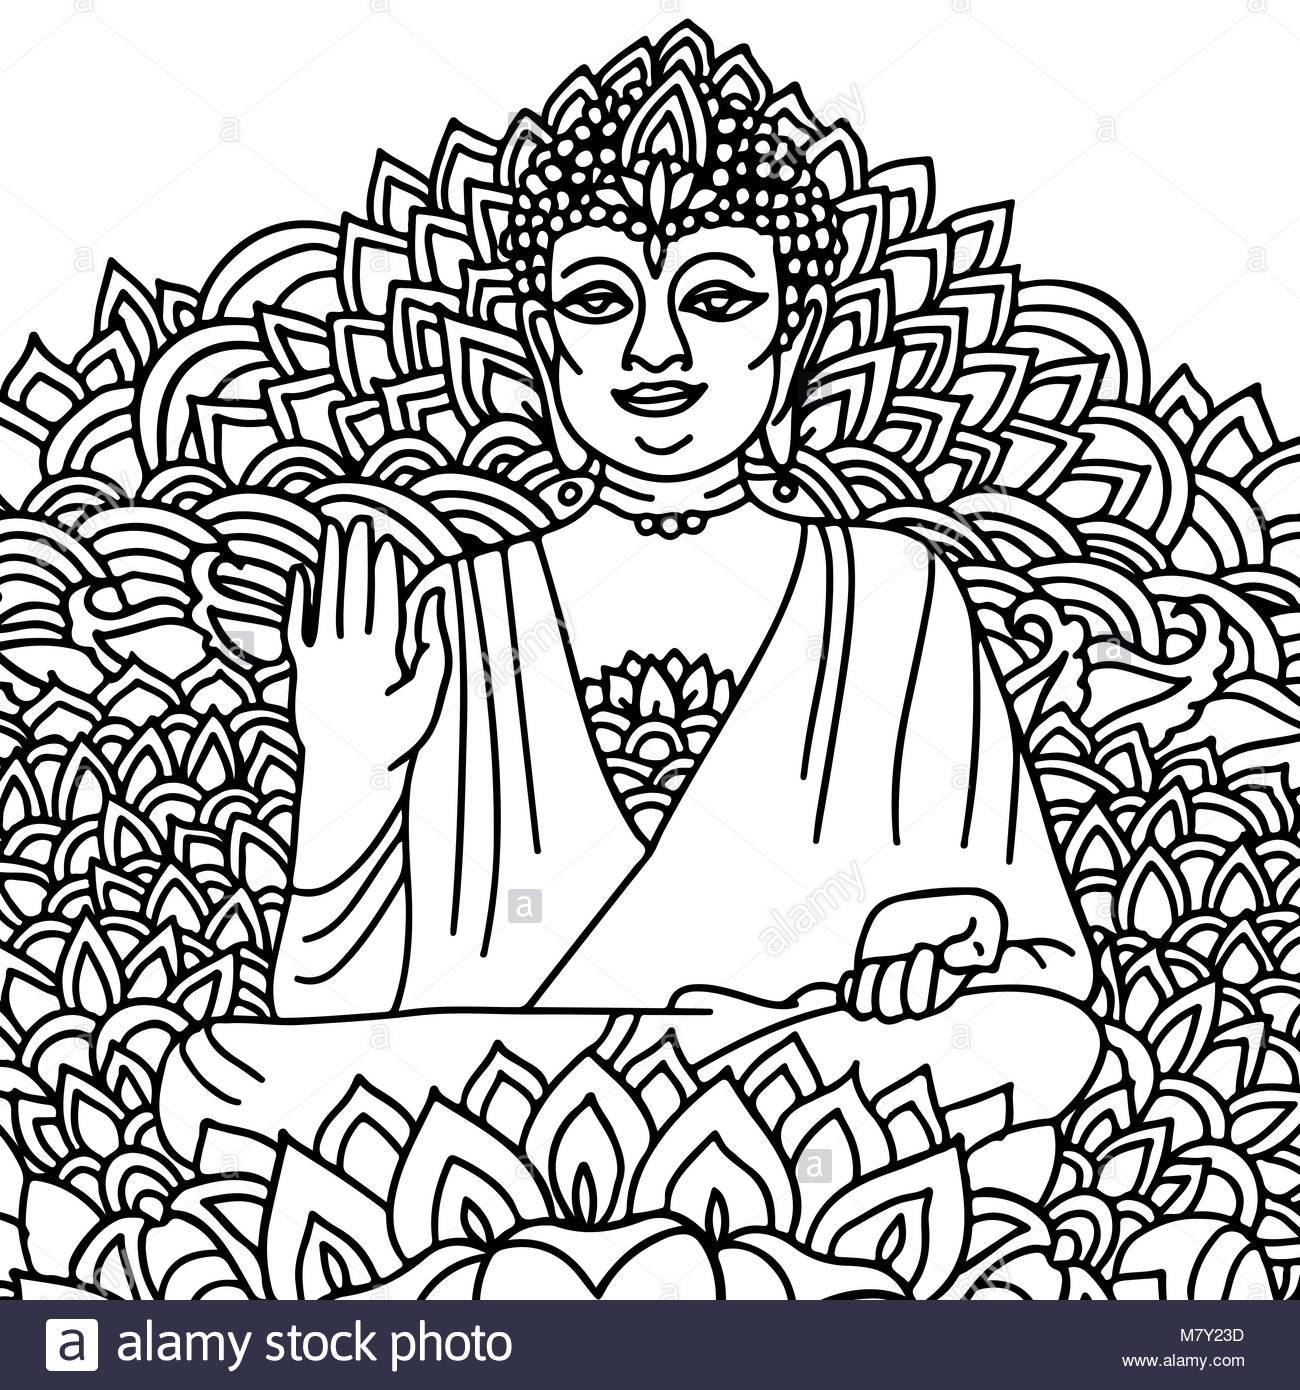 1300x1390 Sitting Buddha Stock Vector Images